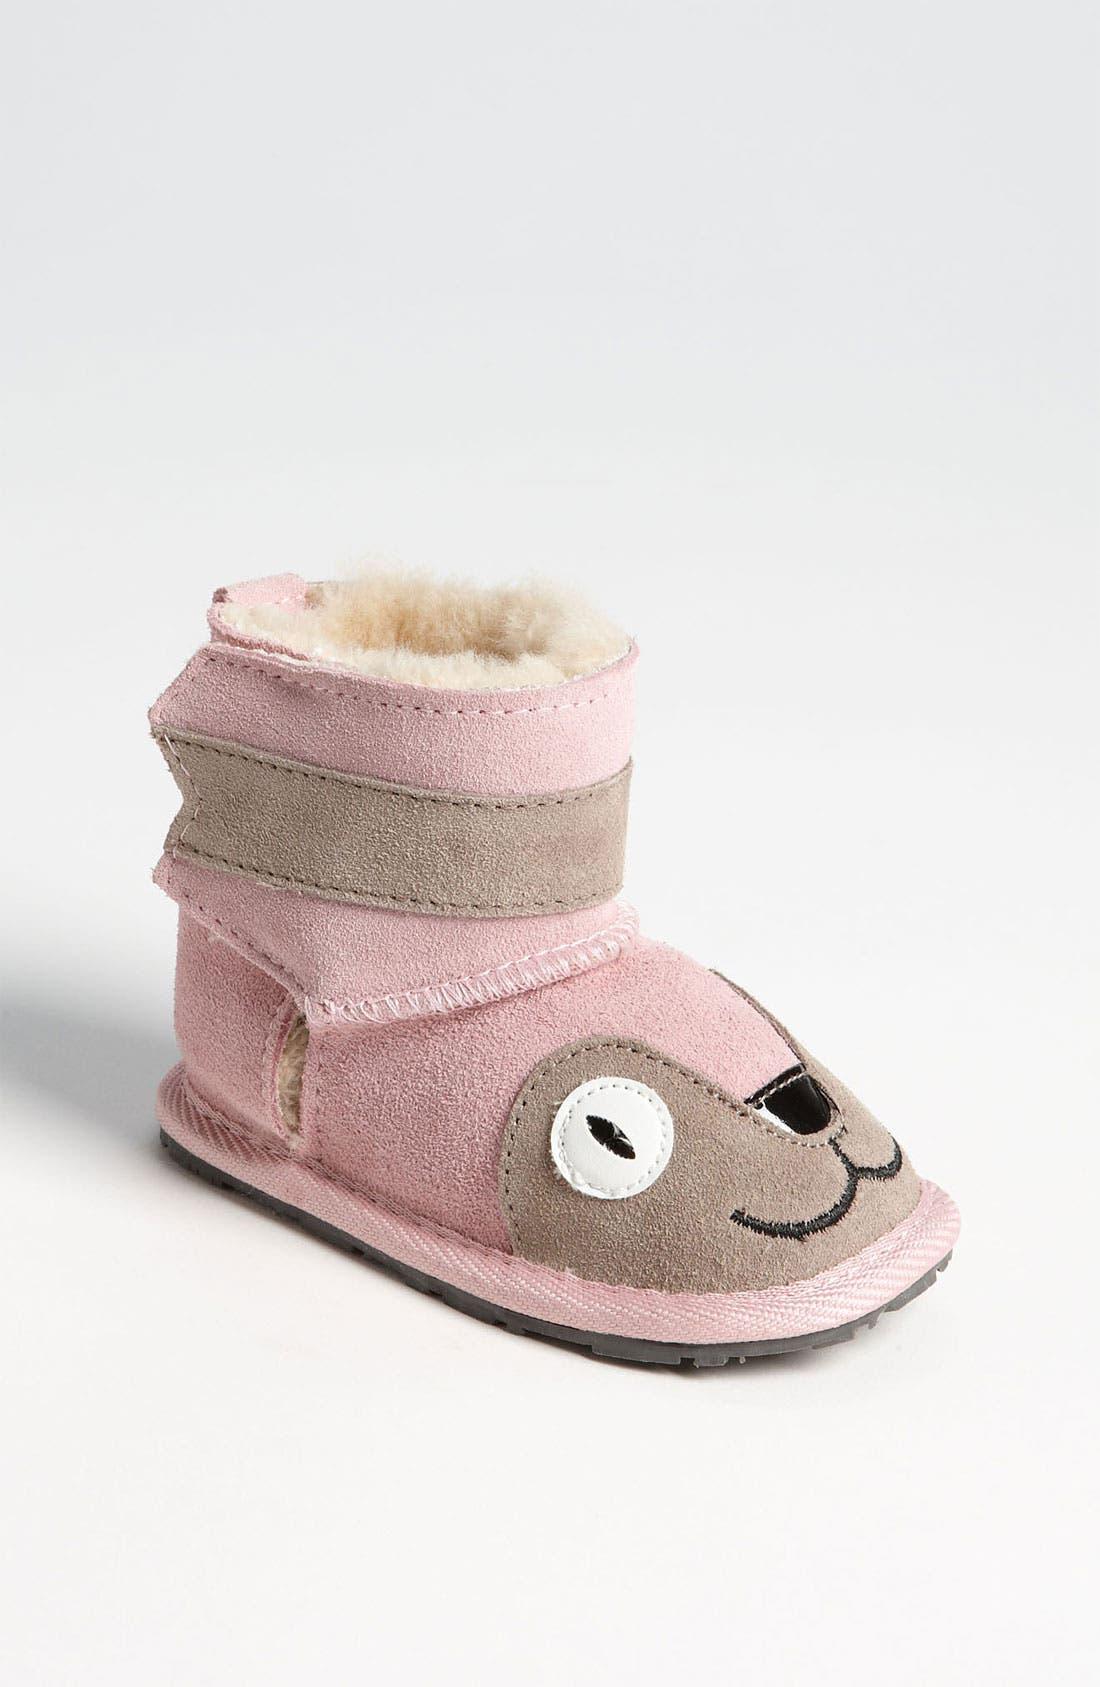 Main Image - EMU Australia 'Little Creatures - Kitty' Boot (Baby & Walker)